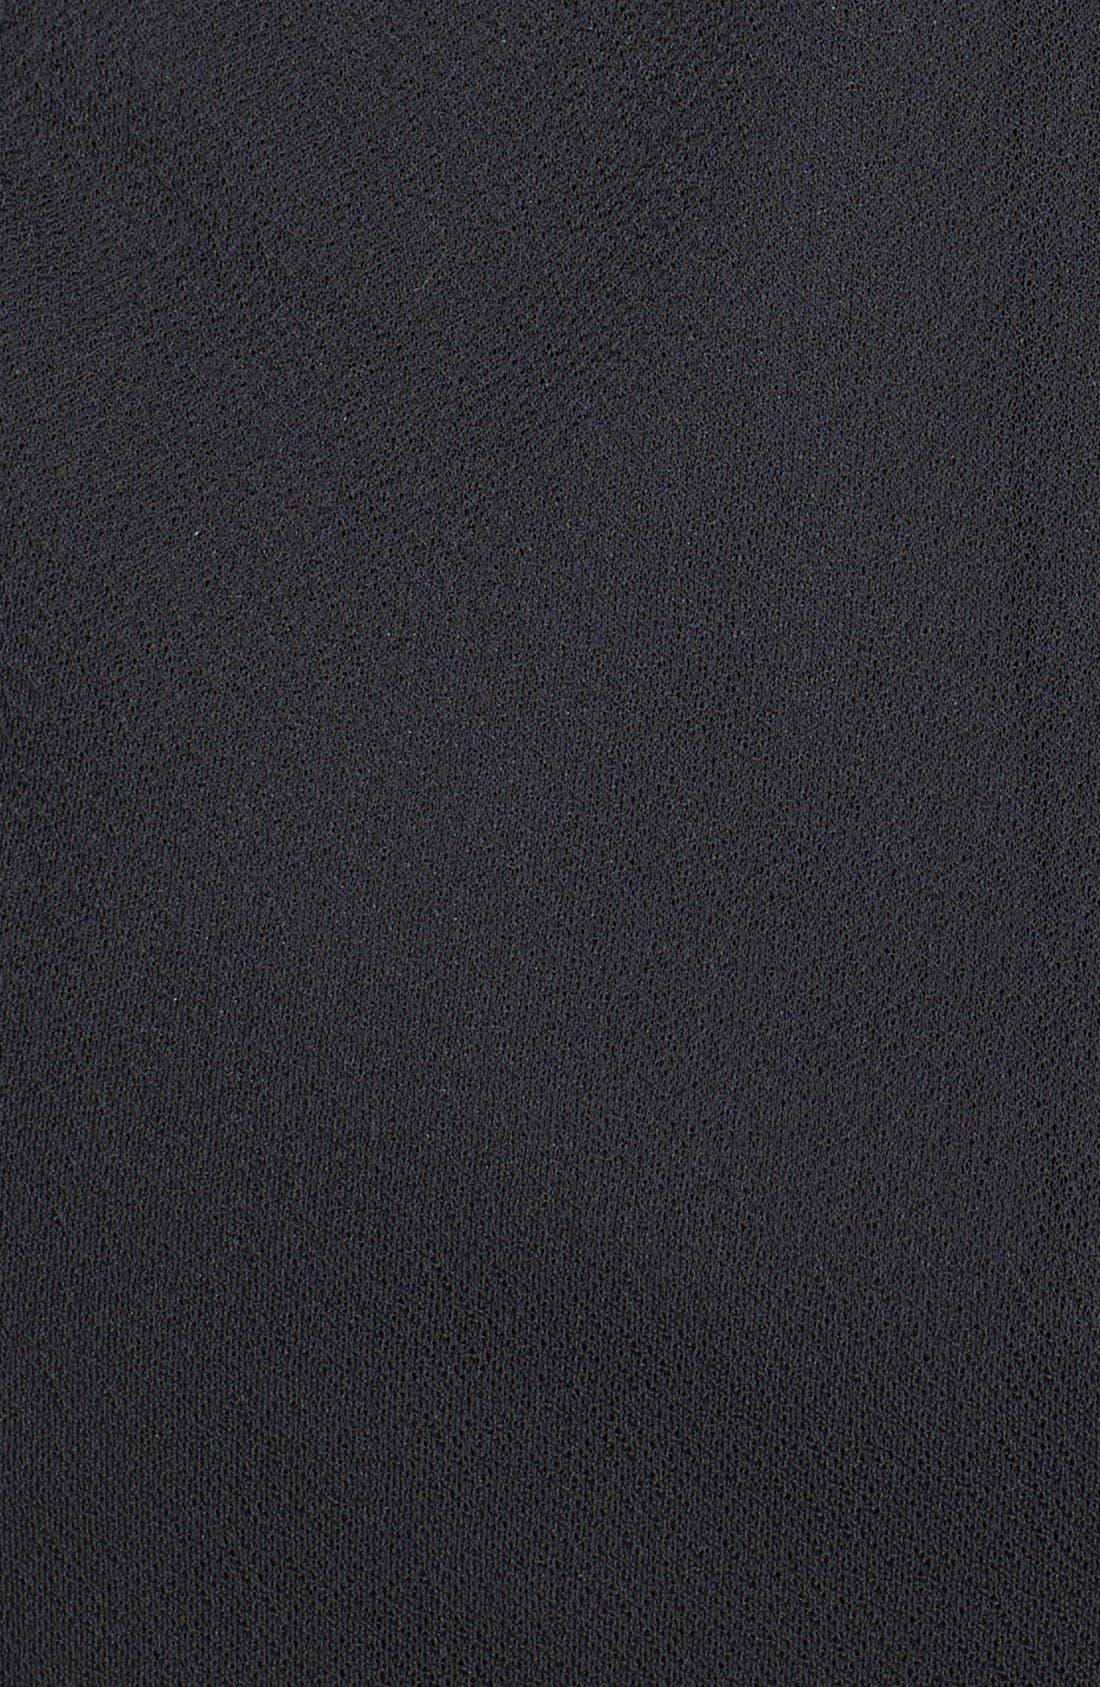 Alternate Image 3  - Maggy London Embellished Draped Mesh Dress (Petite)